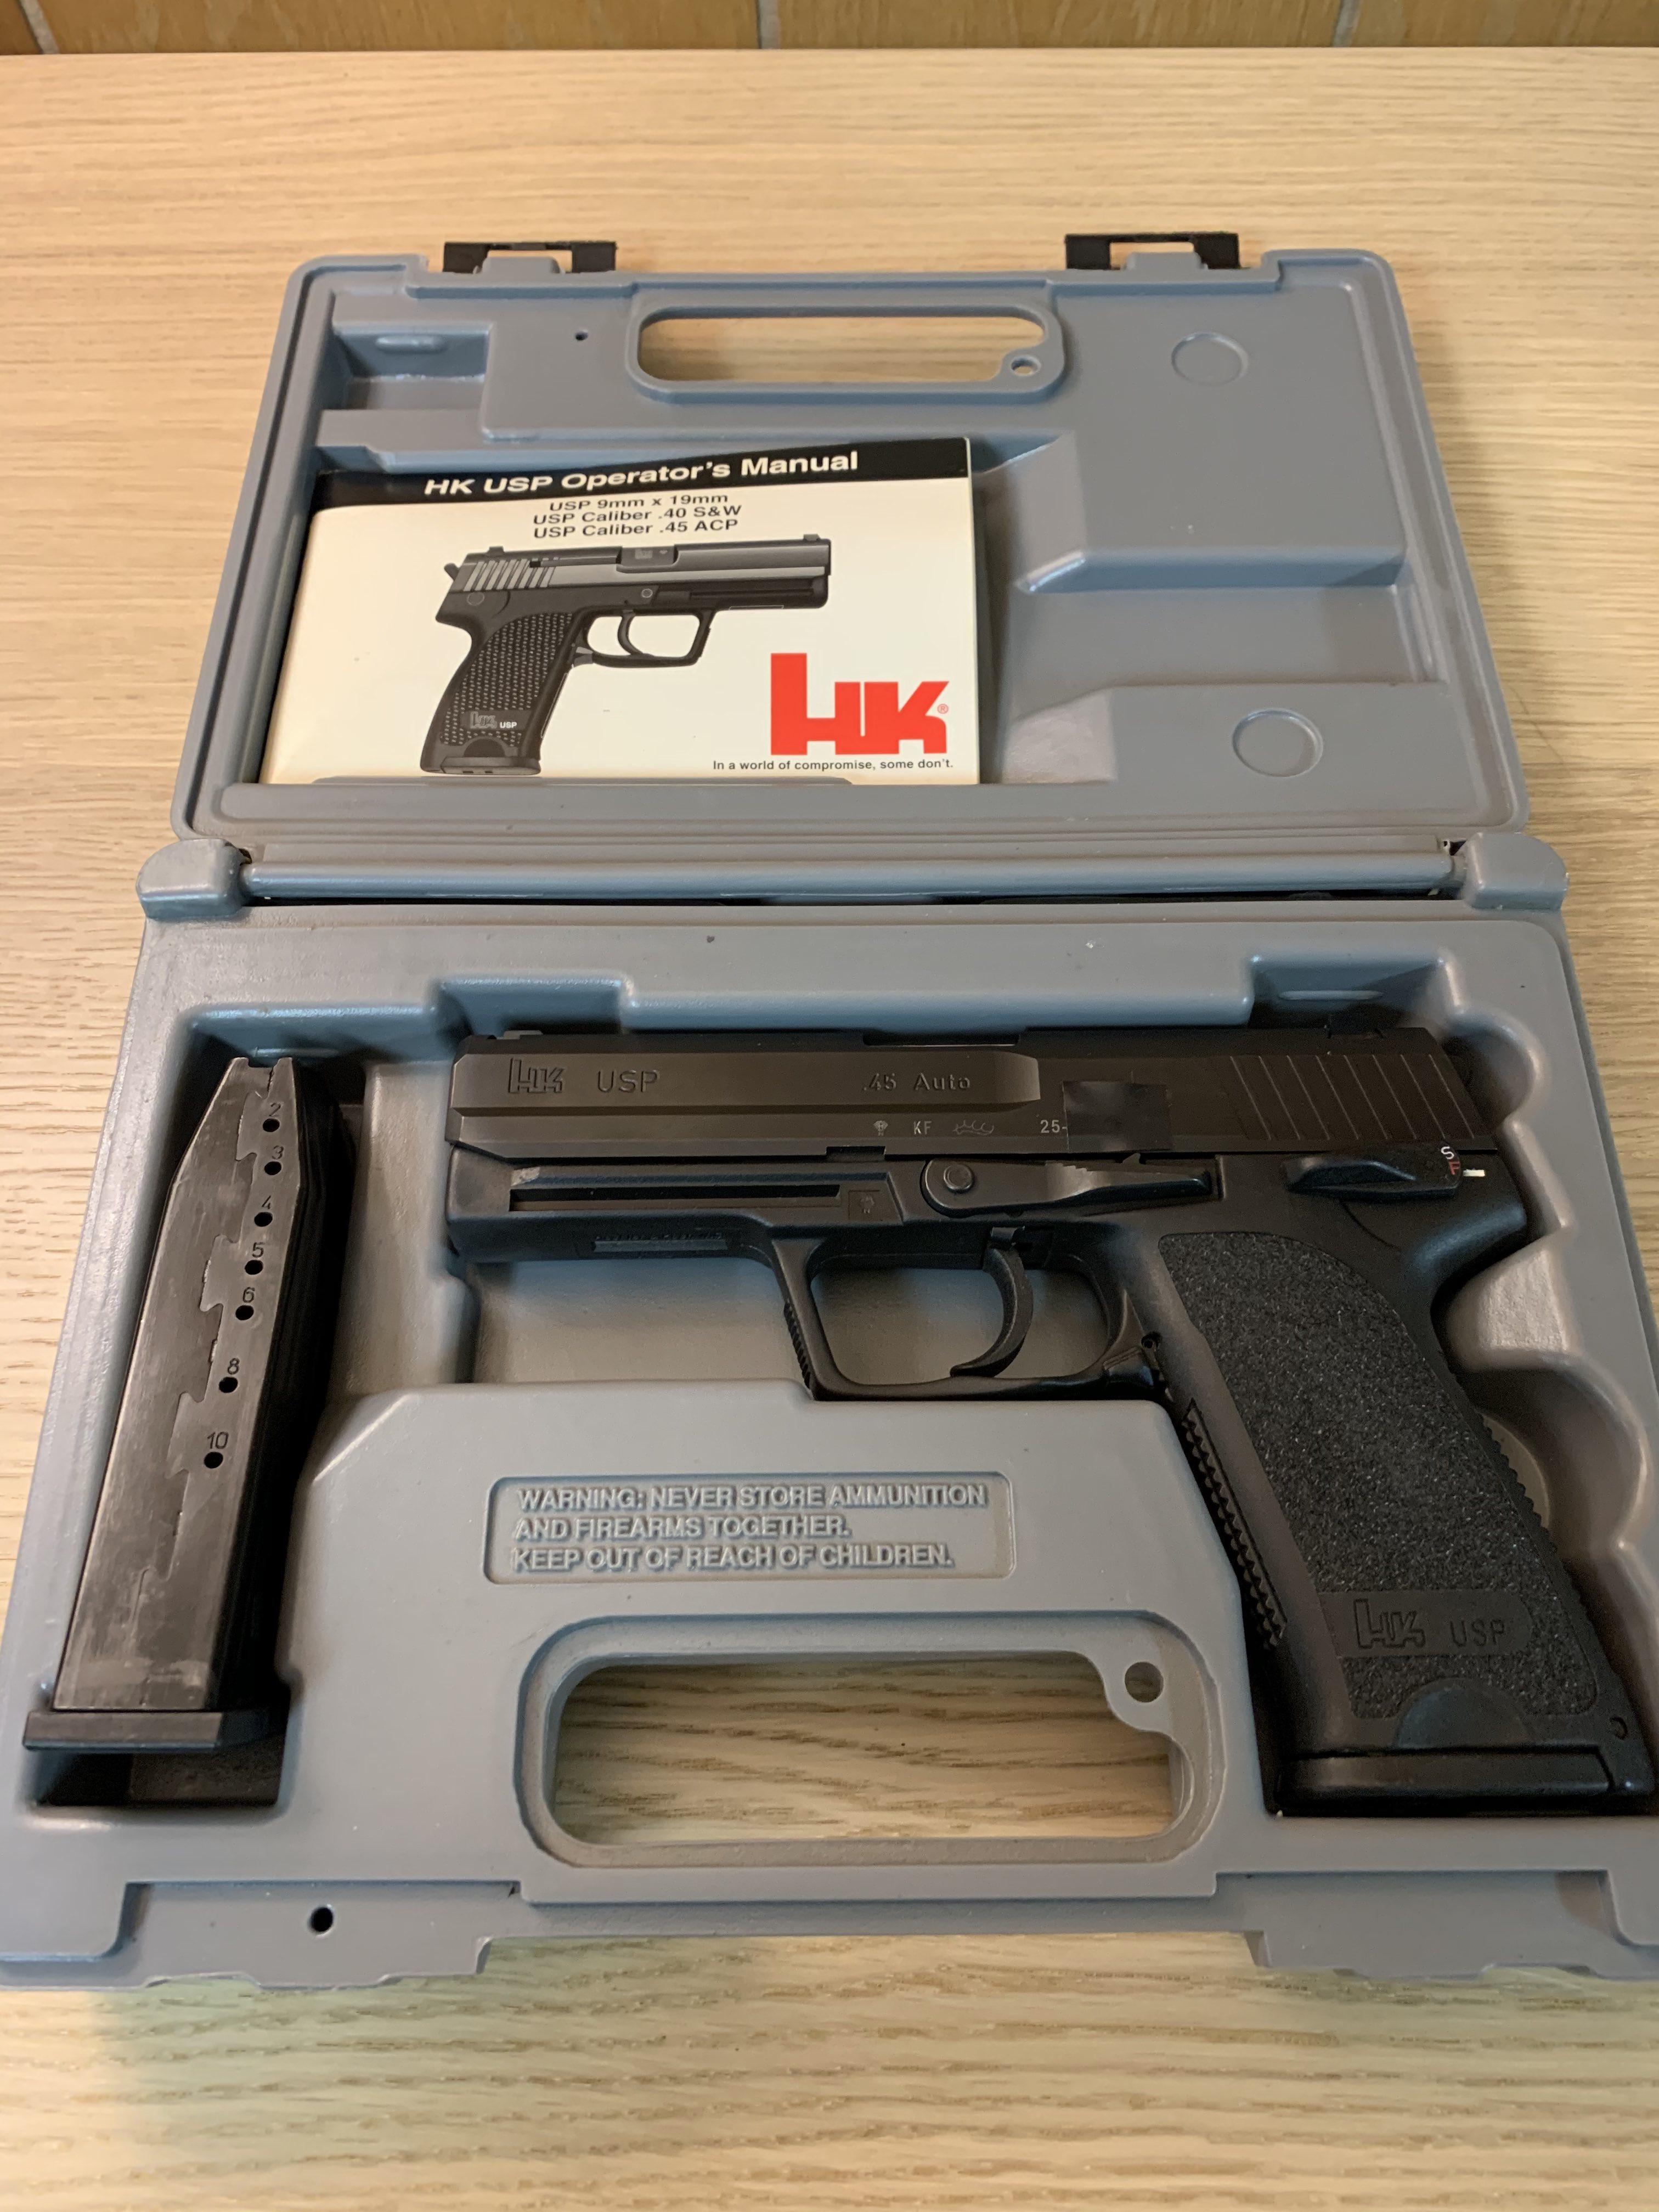 SOLD: HK USP45 V1 KF Lowered price 5 shipped FFL to FFL-hk-case.jpg